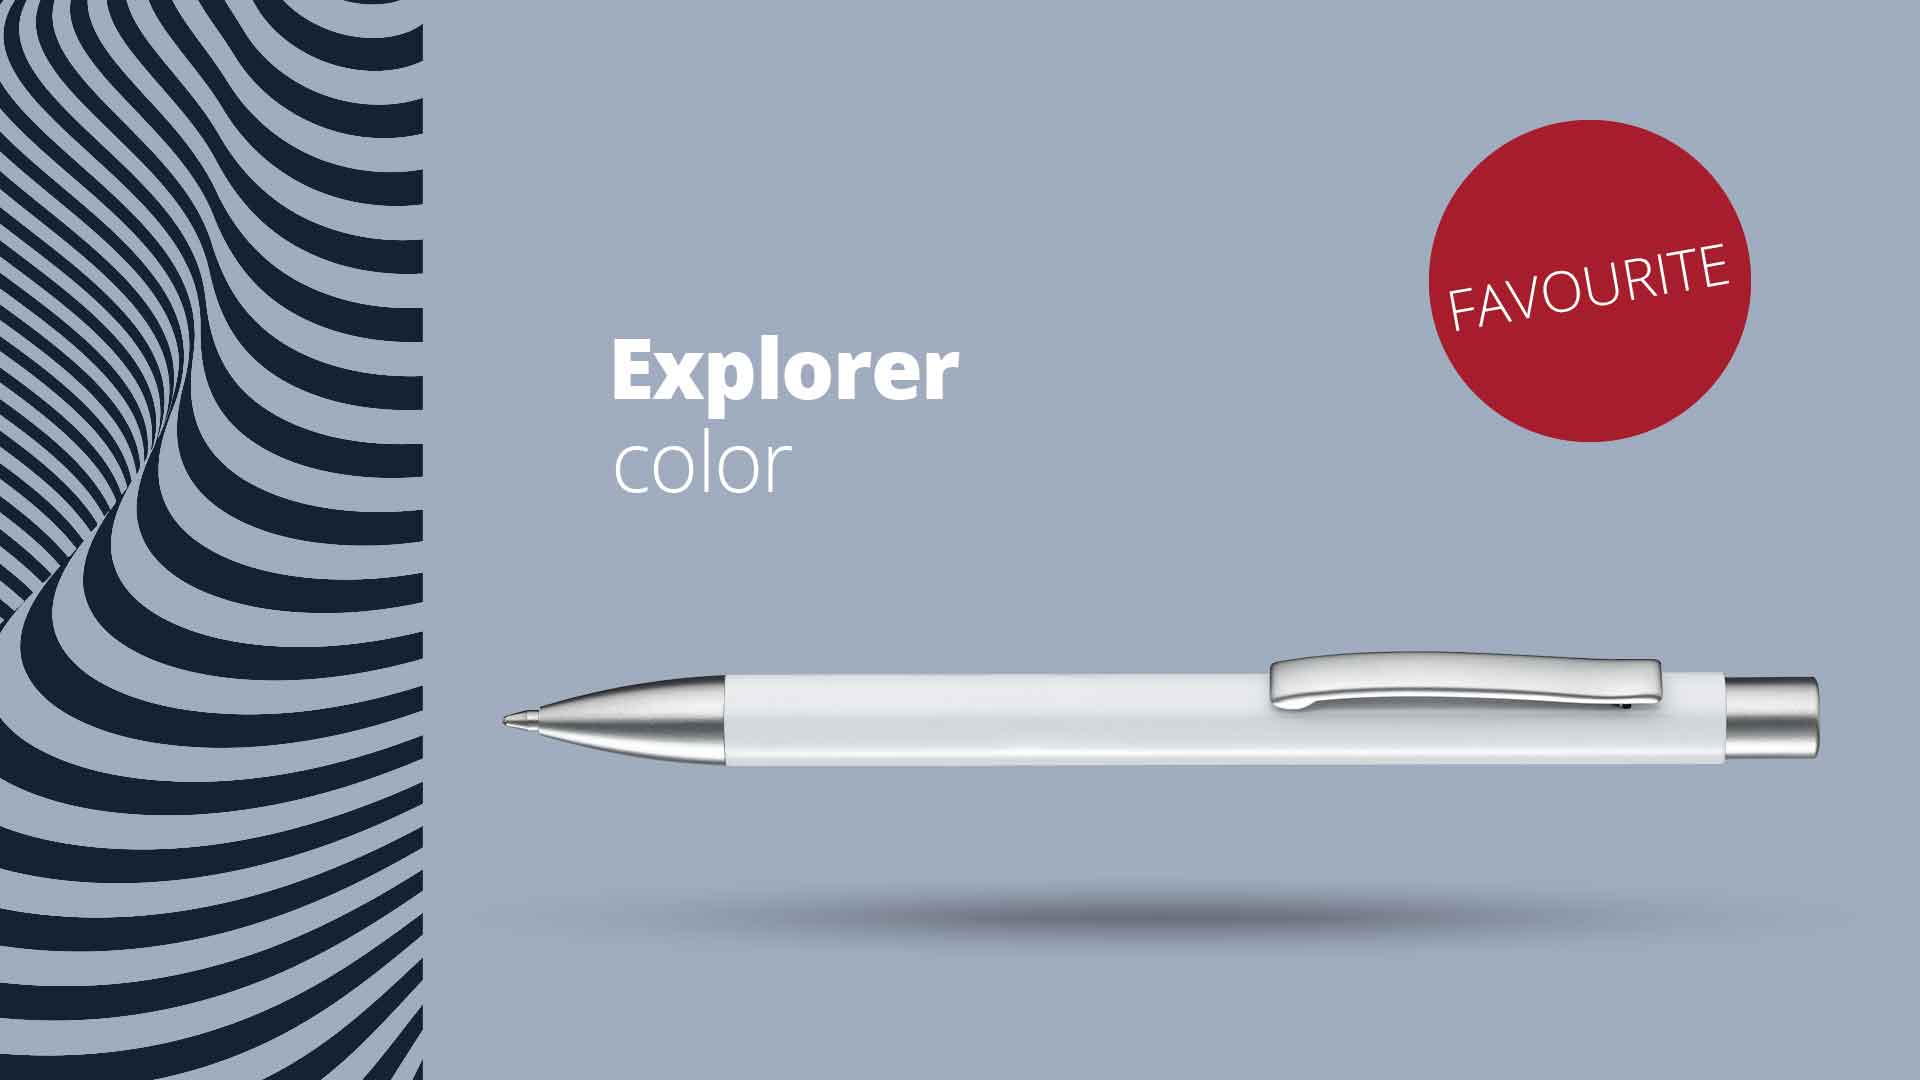 favo_07_explorer_desktop_010_EN